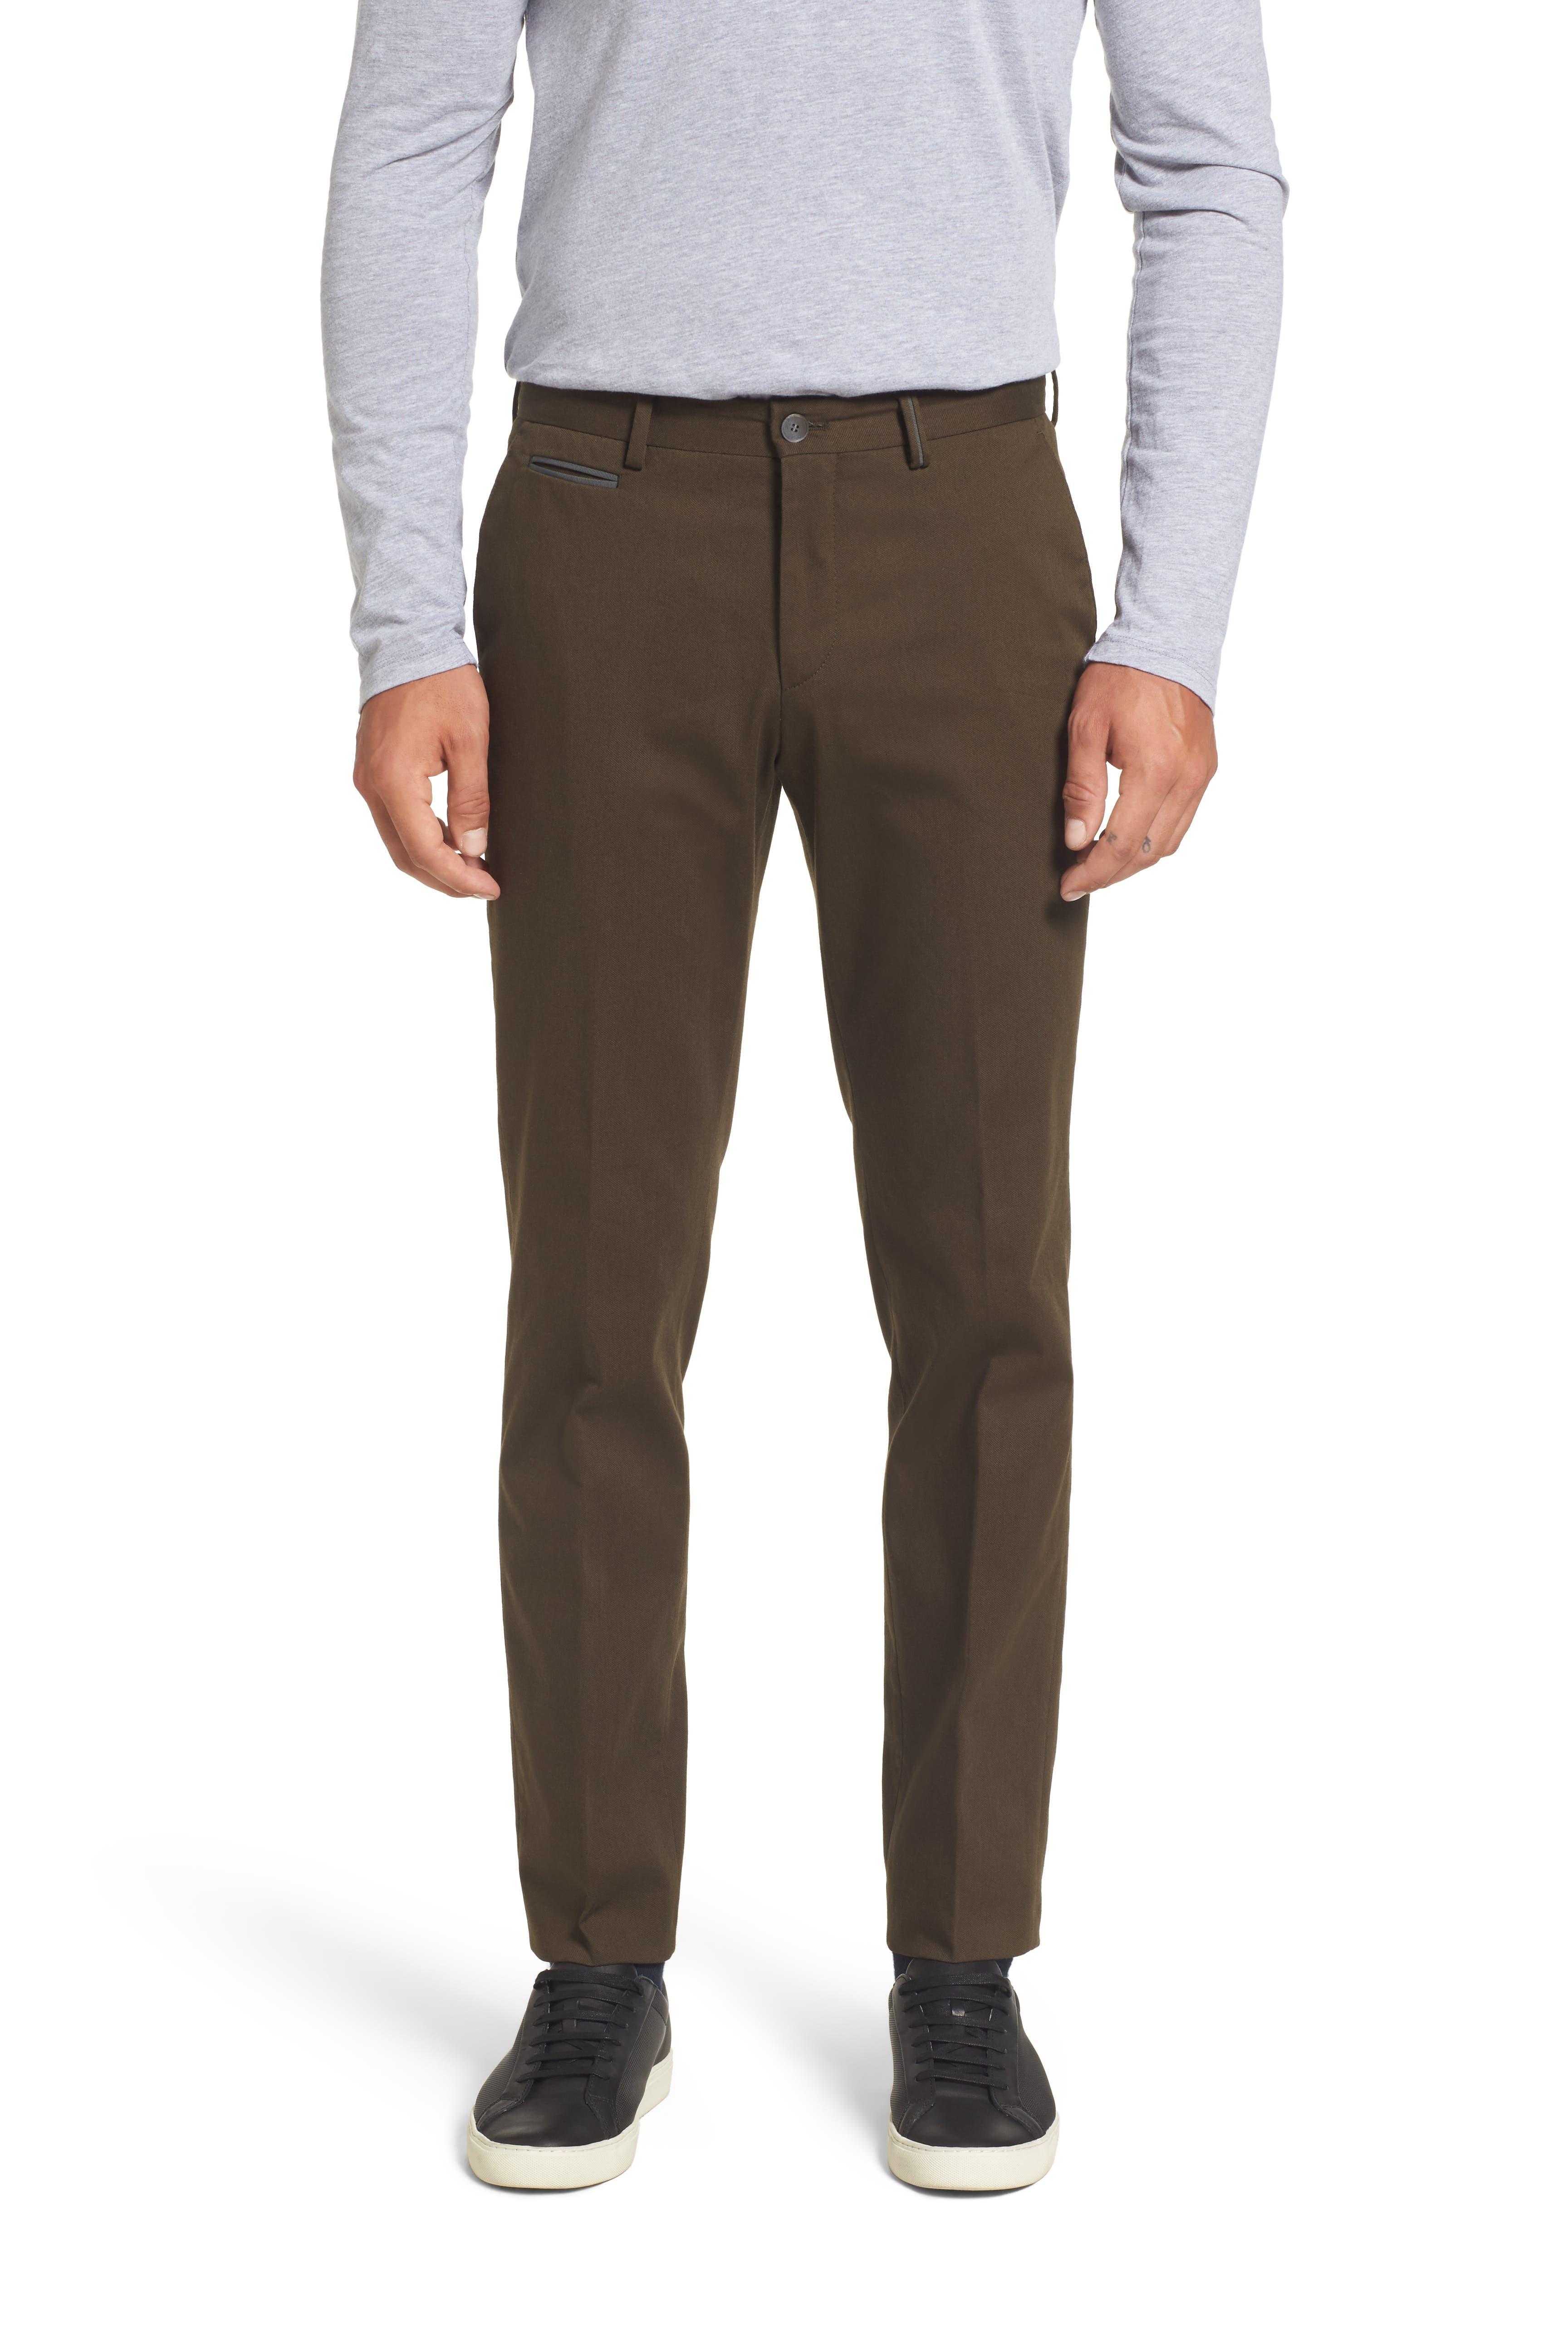 Batho-W Regular Fit Trousers,                             Main thumbnail 1, color,                             342